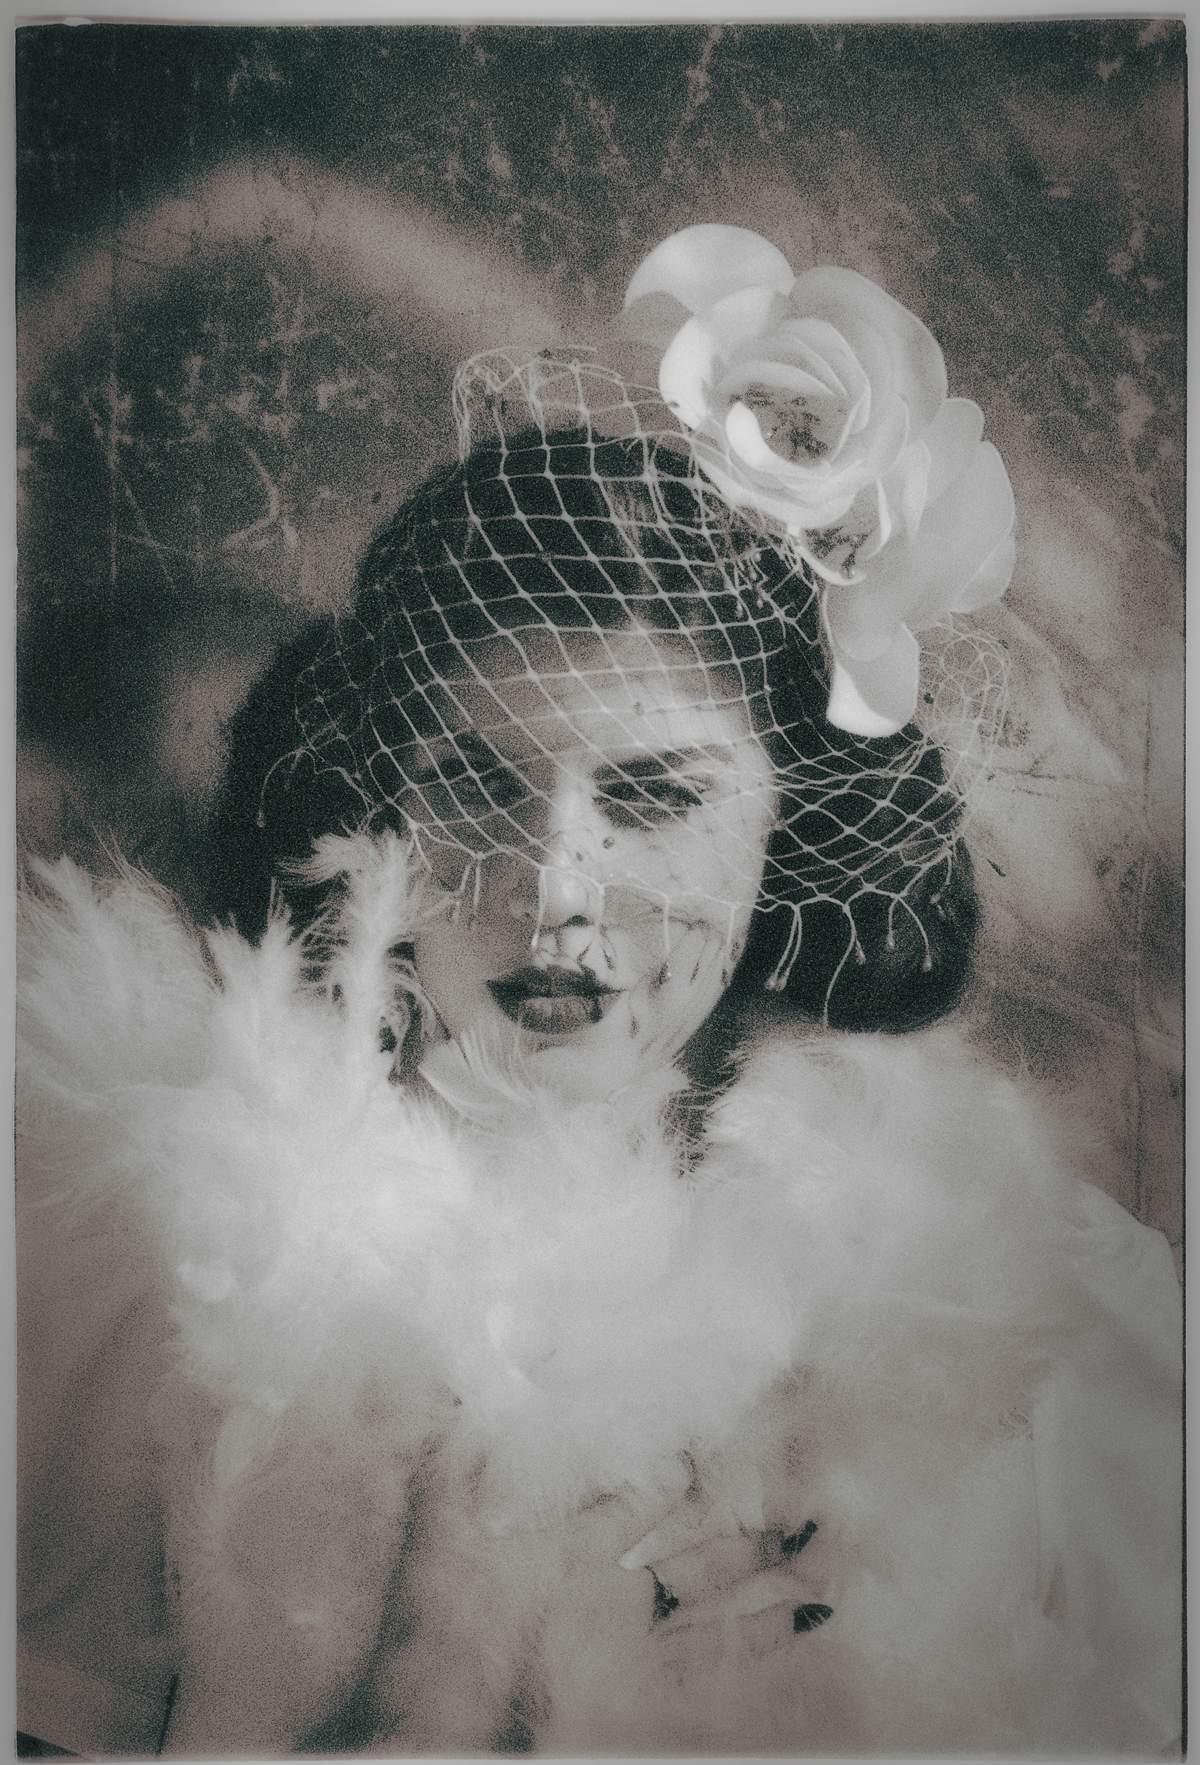 Mina_Glamorous Hats 2018 Bridal Collection_Photographer Oleg Micheyev_Model Miss Cherry on Fire